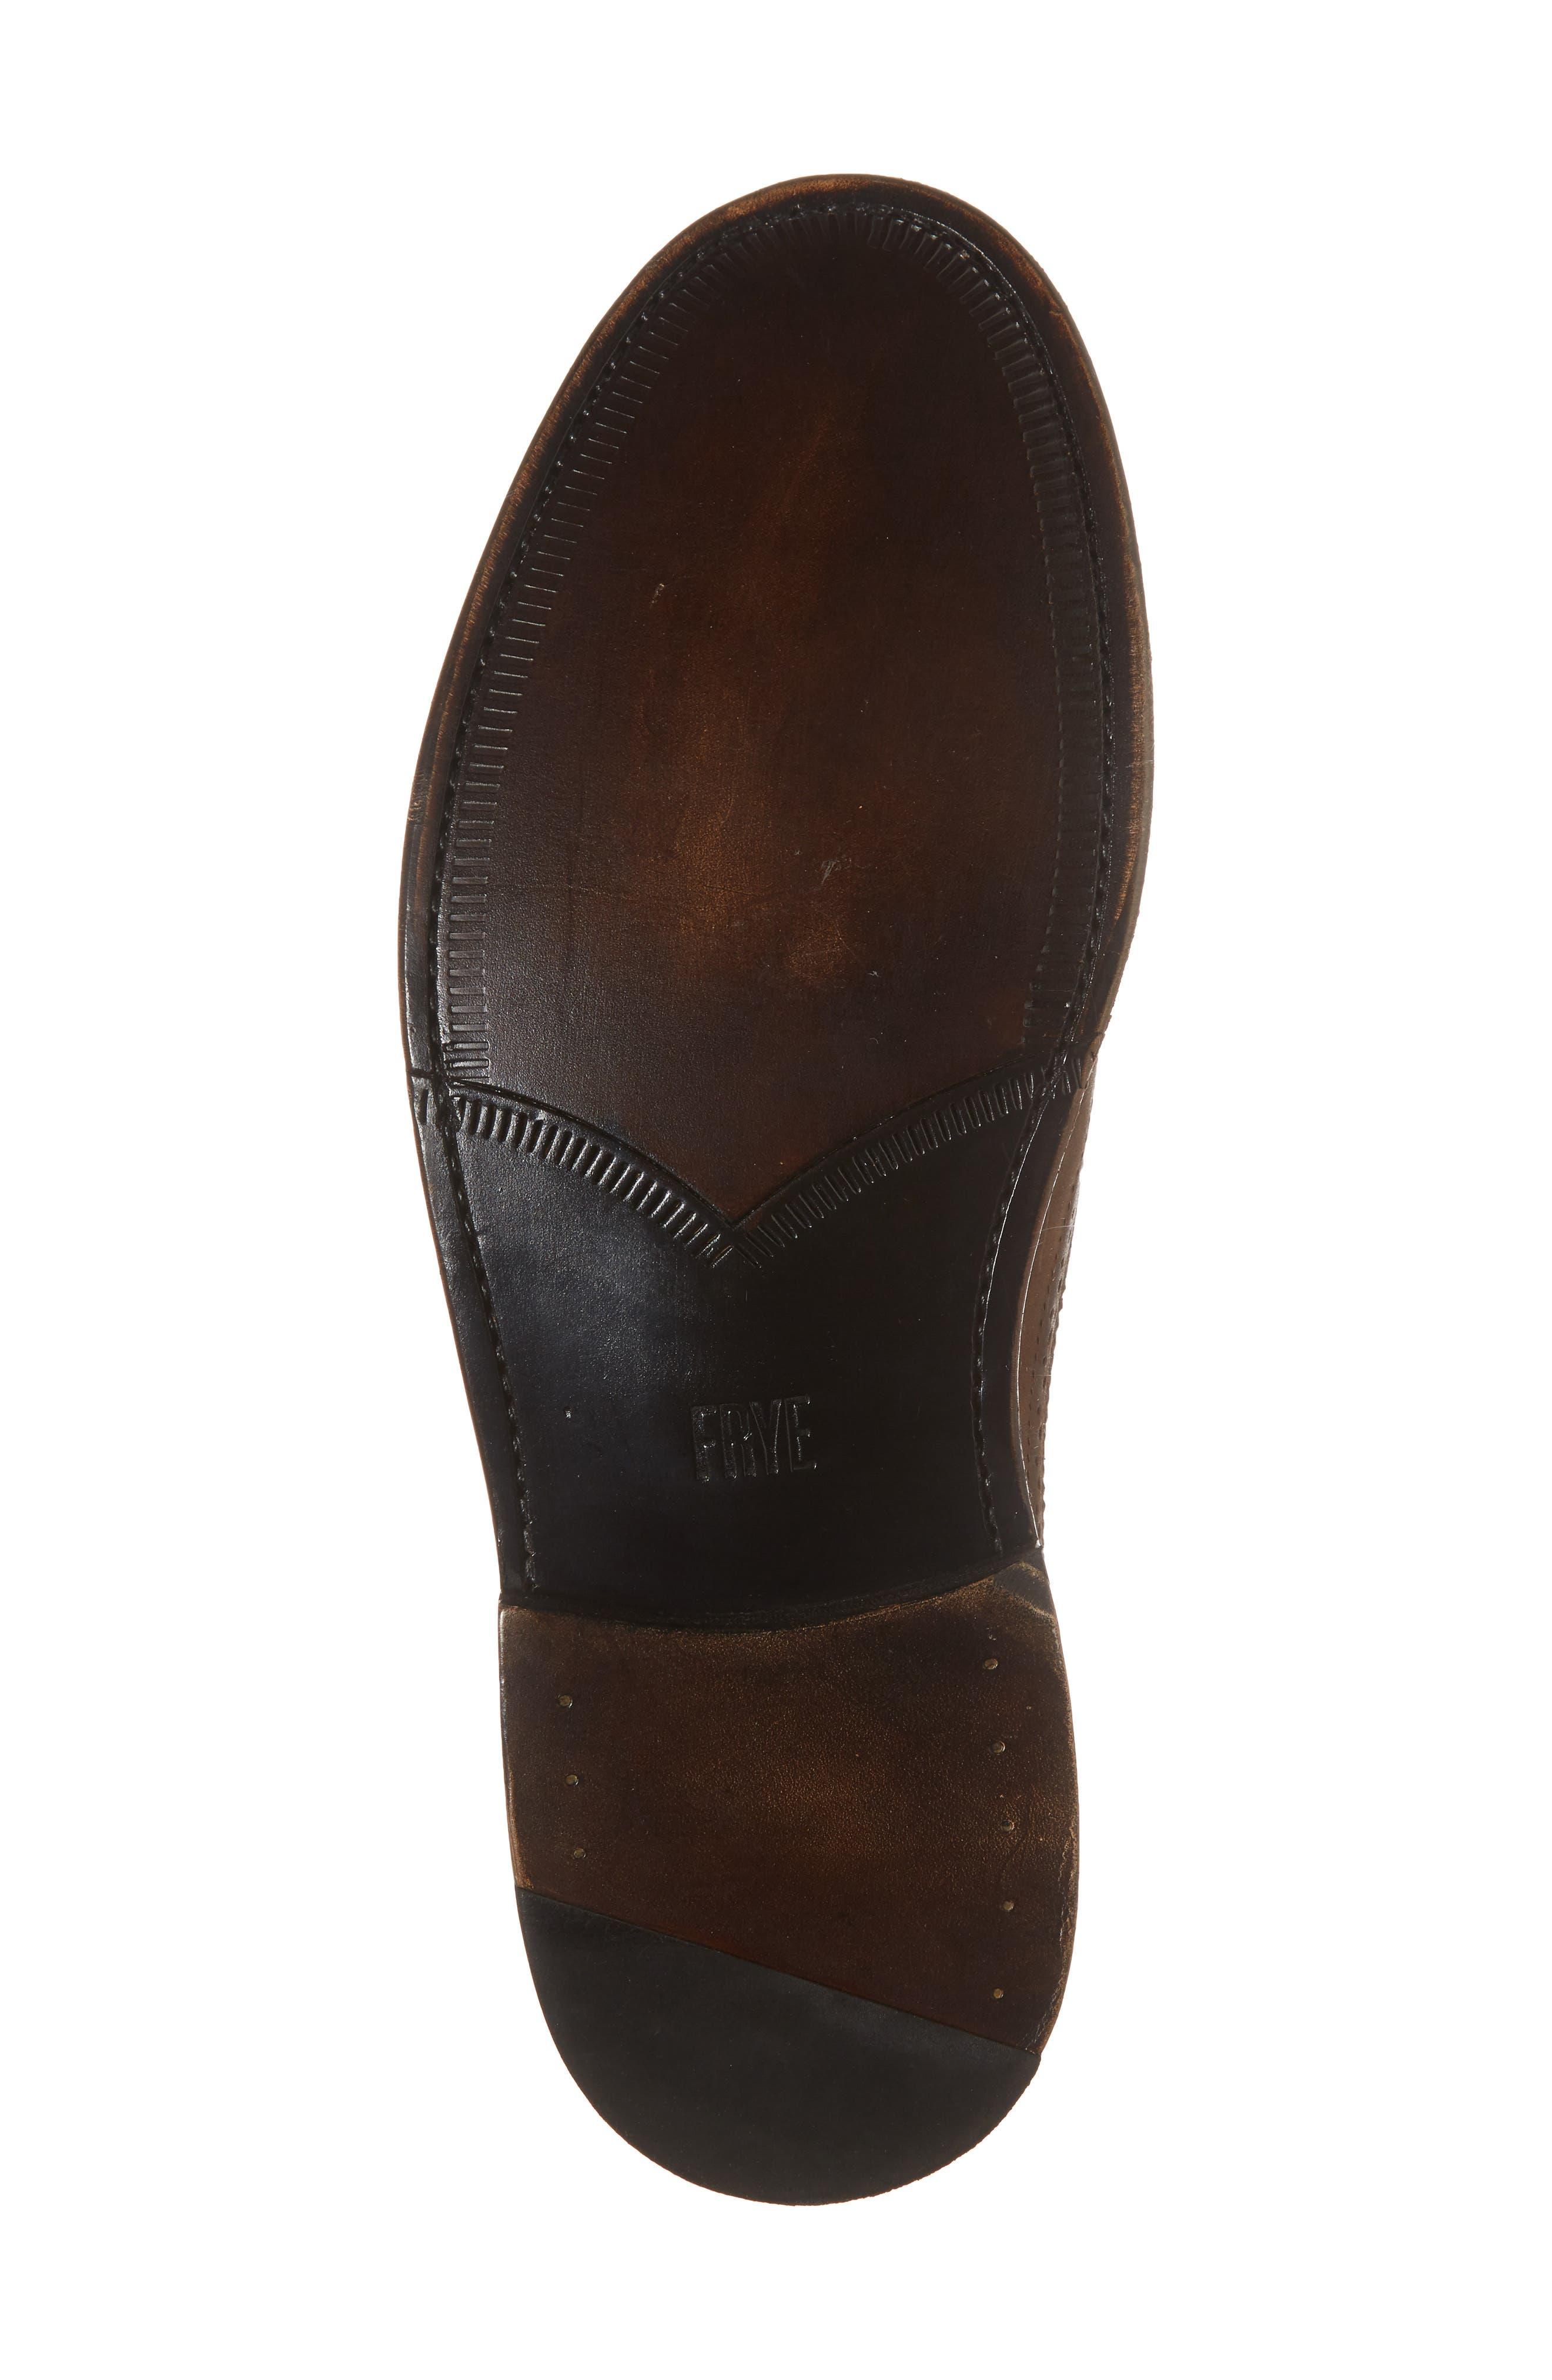 Jones Wingtip,                             Alternate thumbnail 6, color,                             Redwood Leather